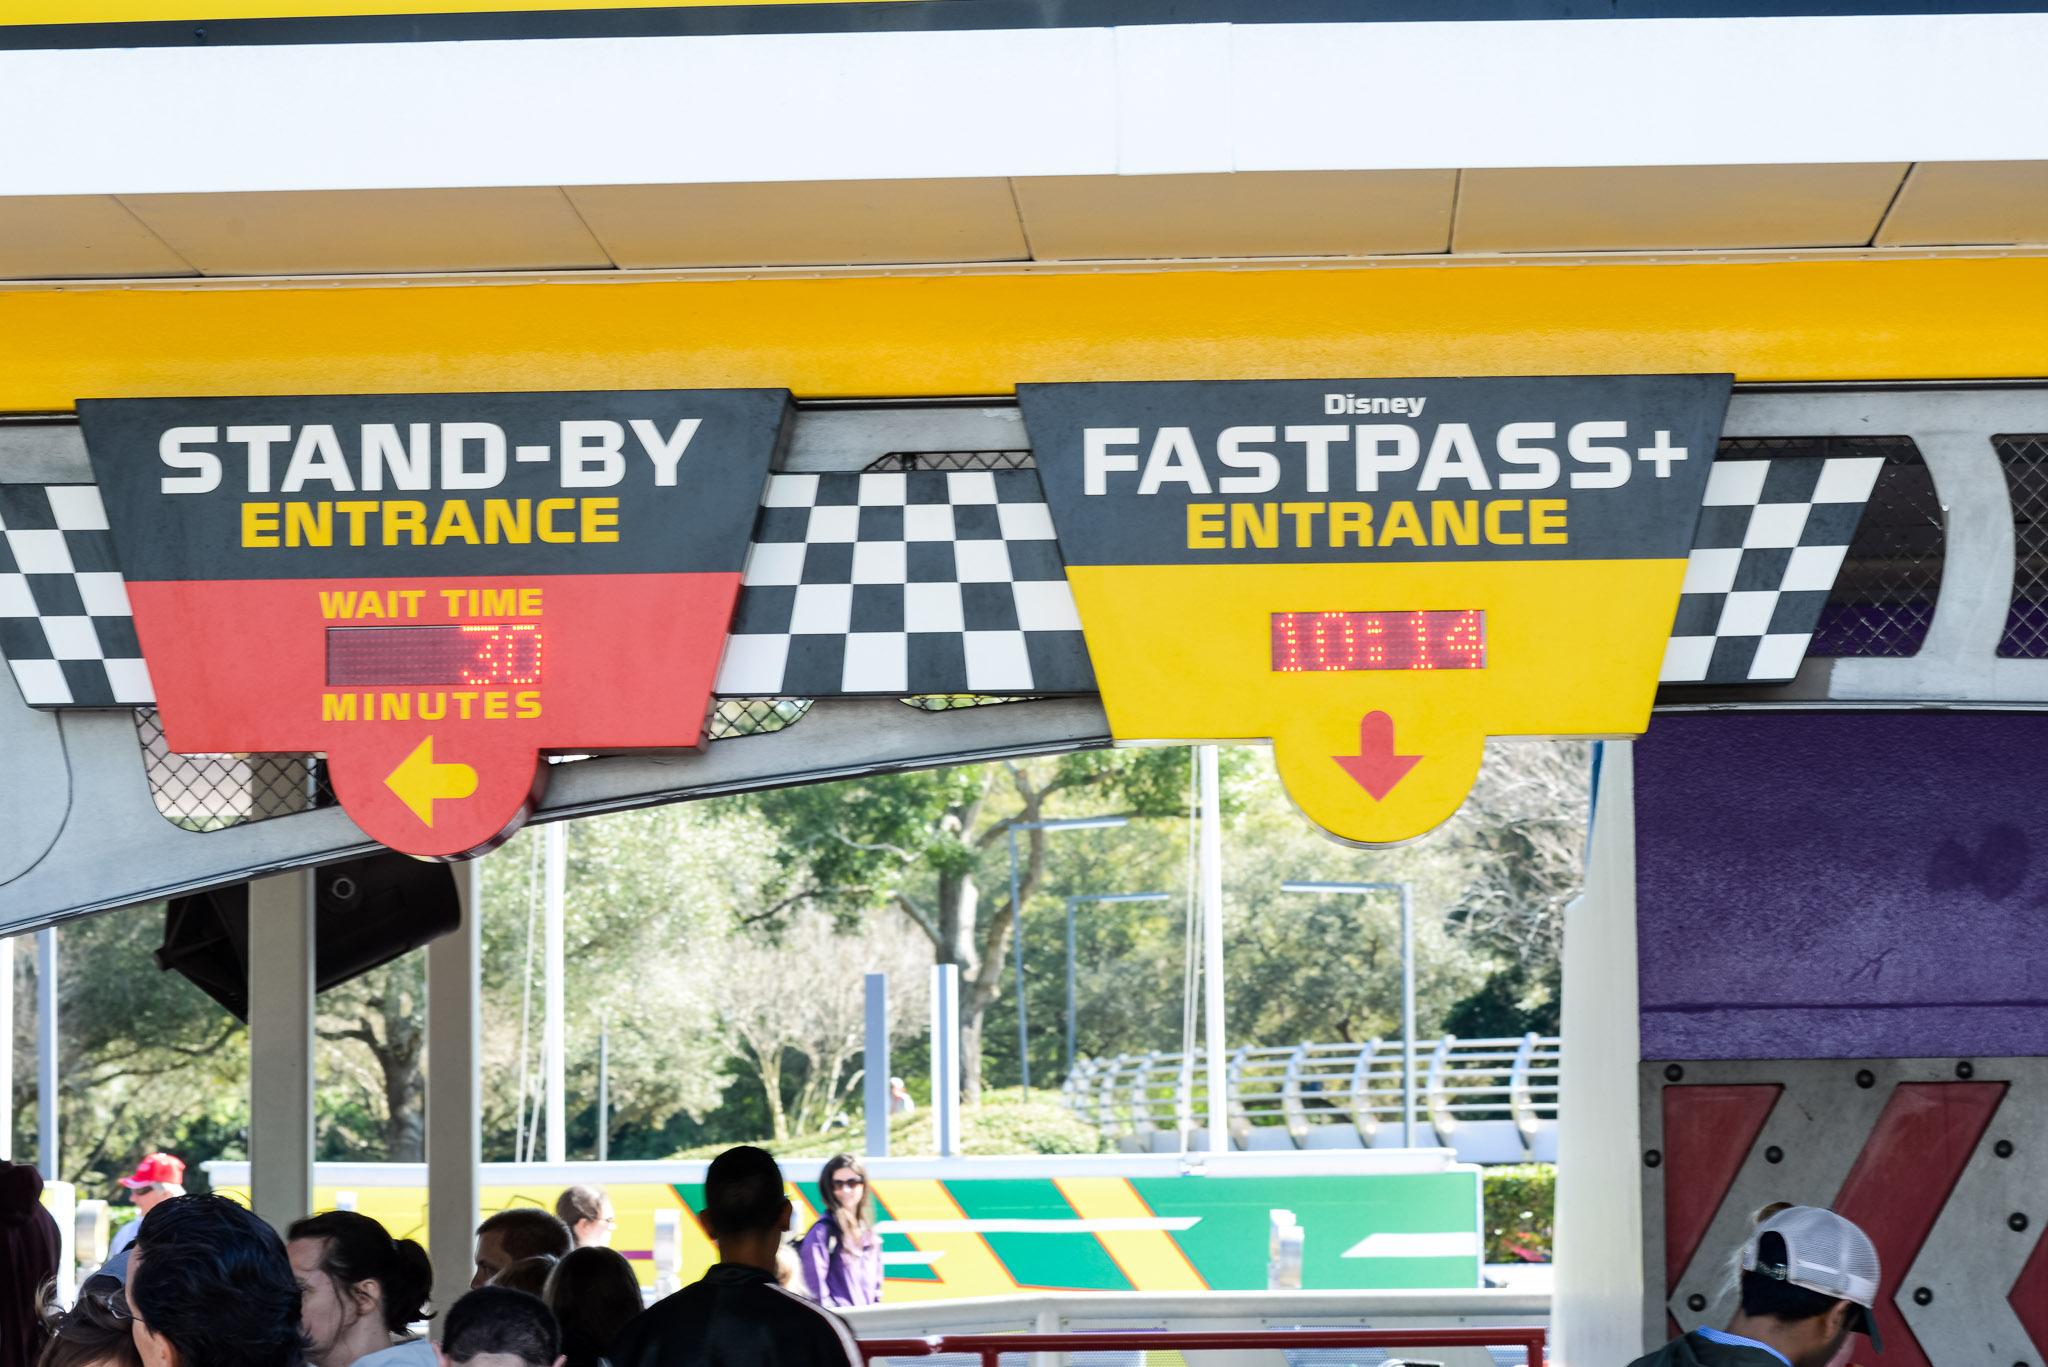 Tomorrowland Speedway Wait Again - Walt Disney World Magic Kingdom